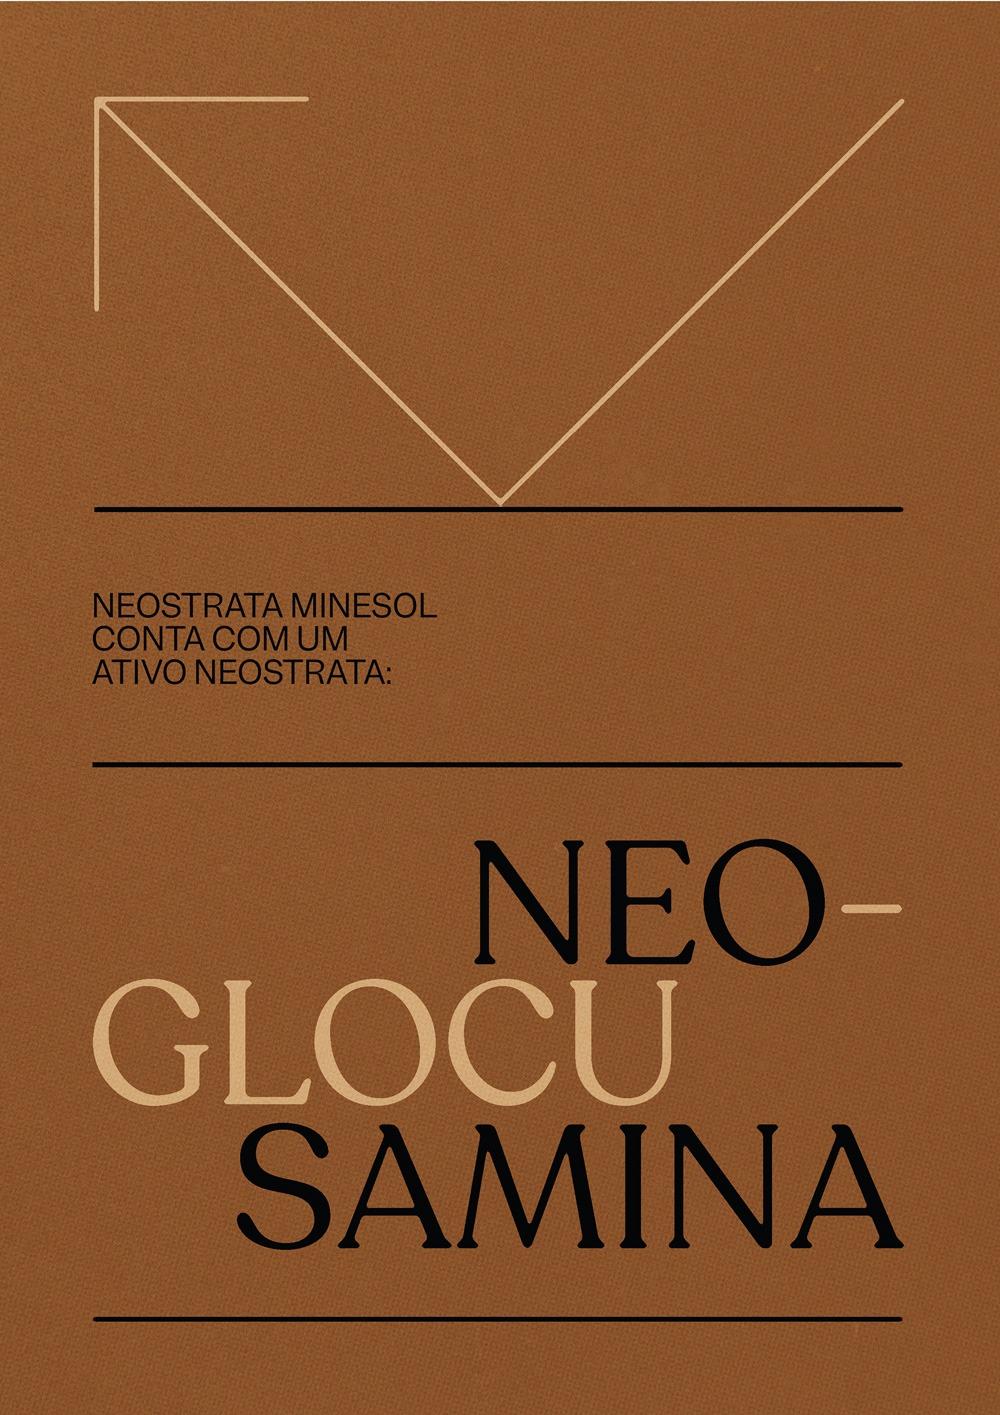 neostrata-11